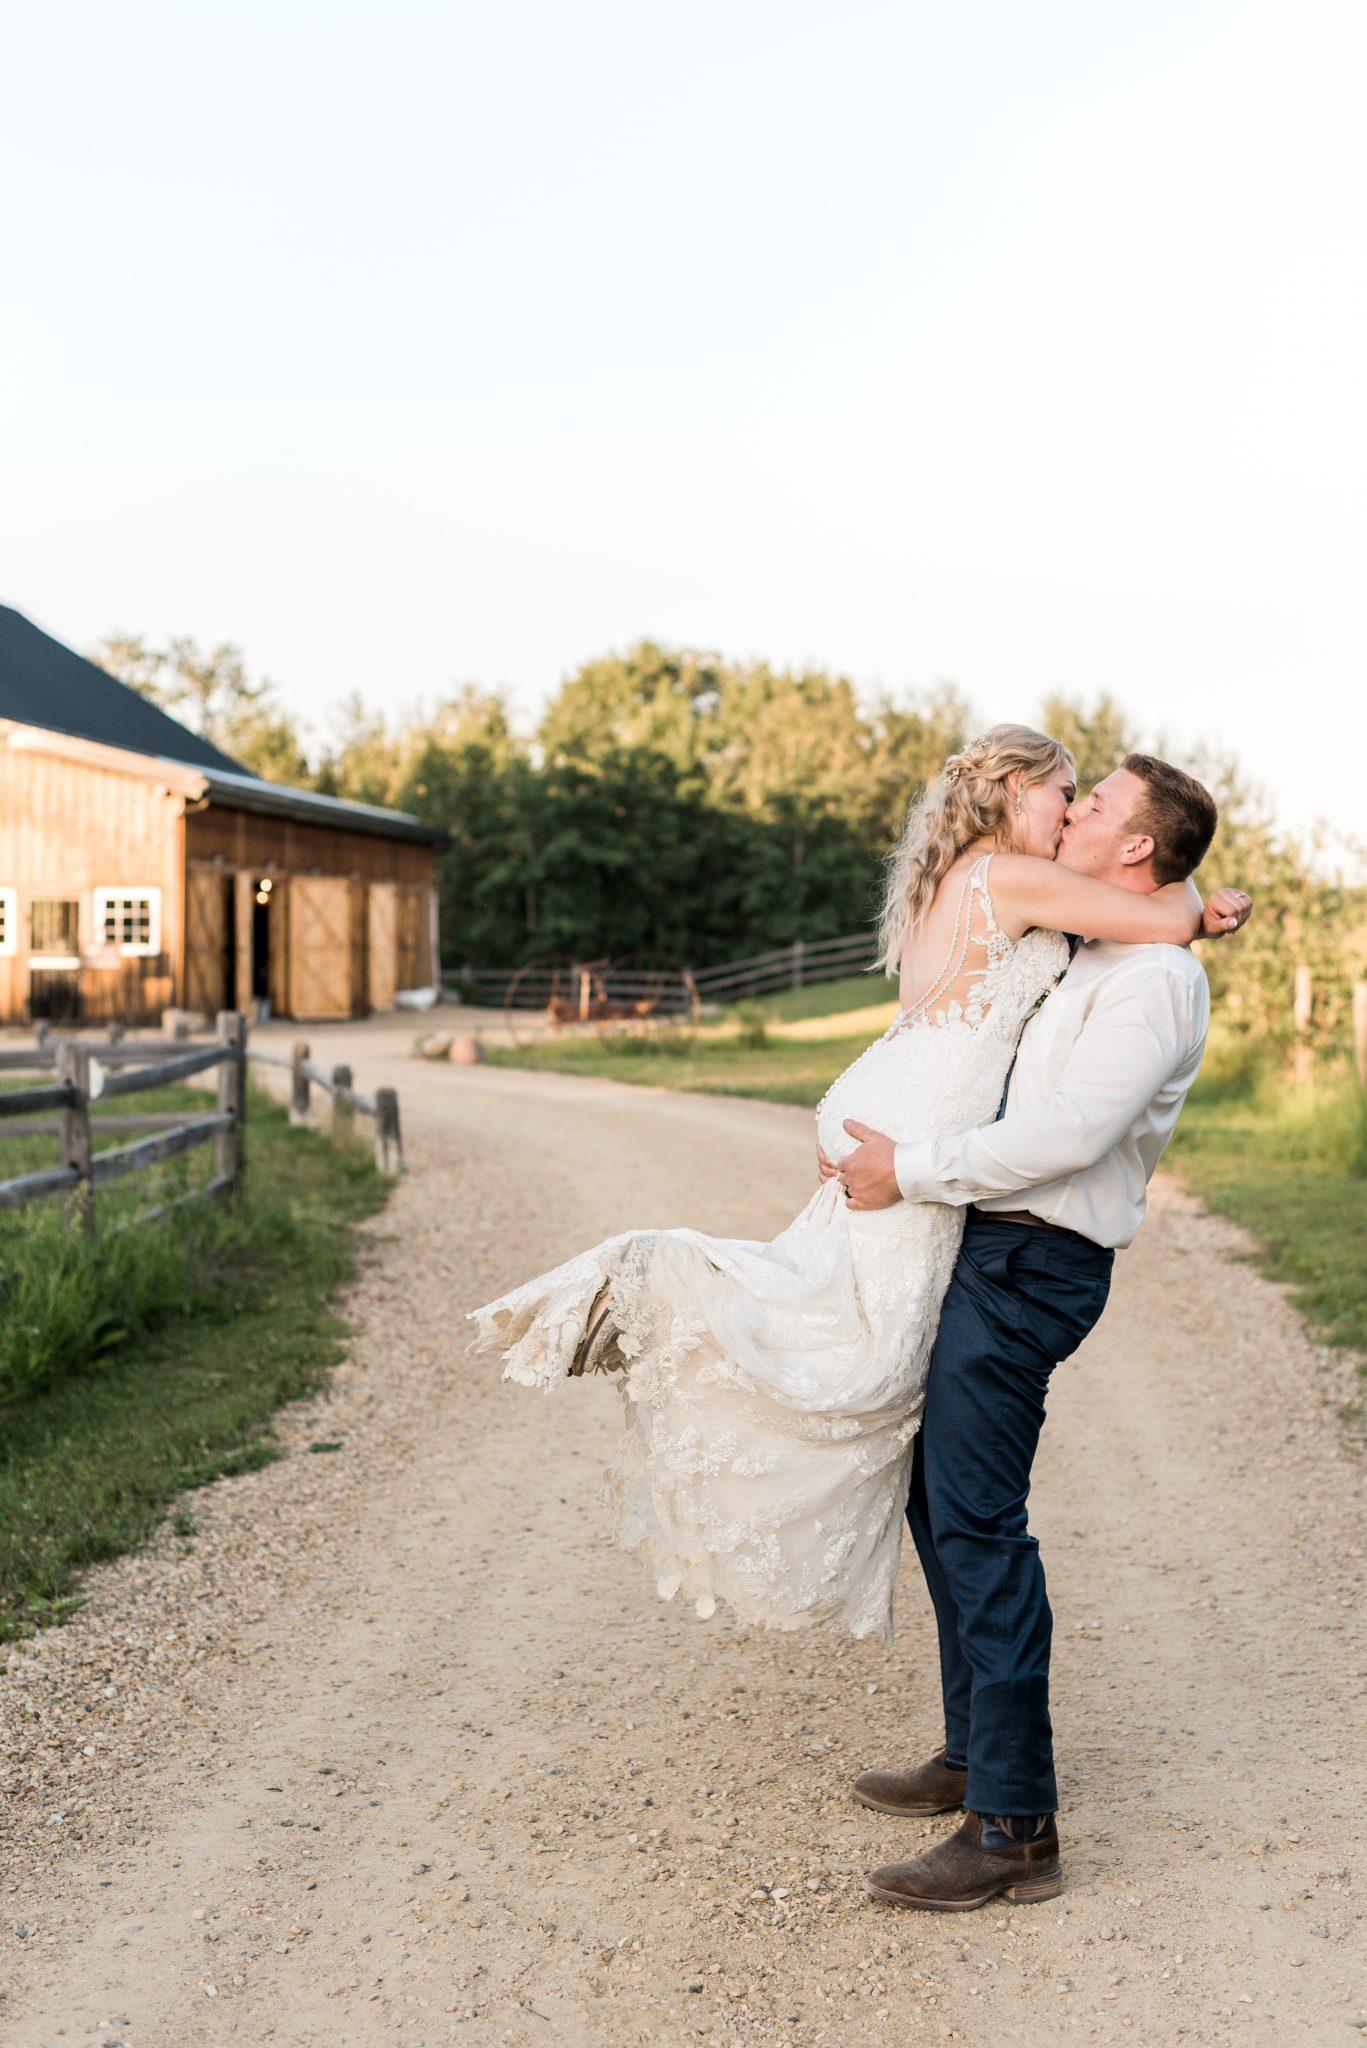 Western Wedding at Lions Garden in Alberta Canada